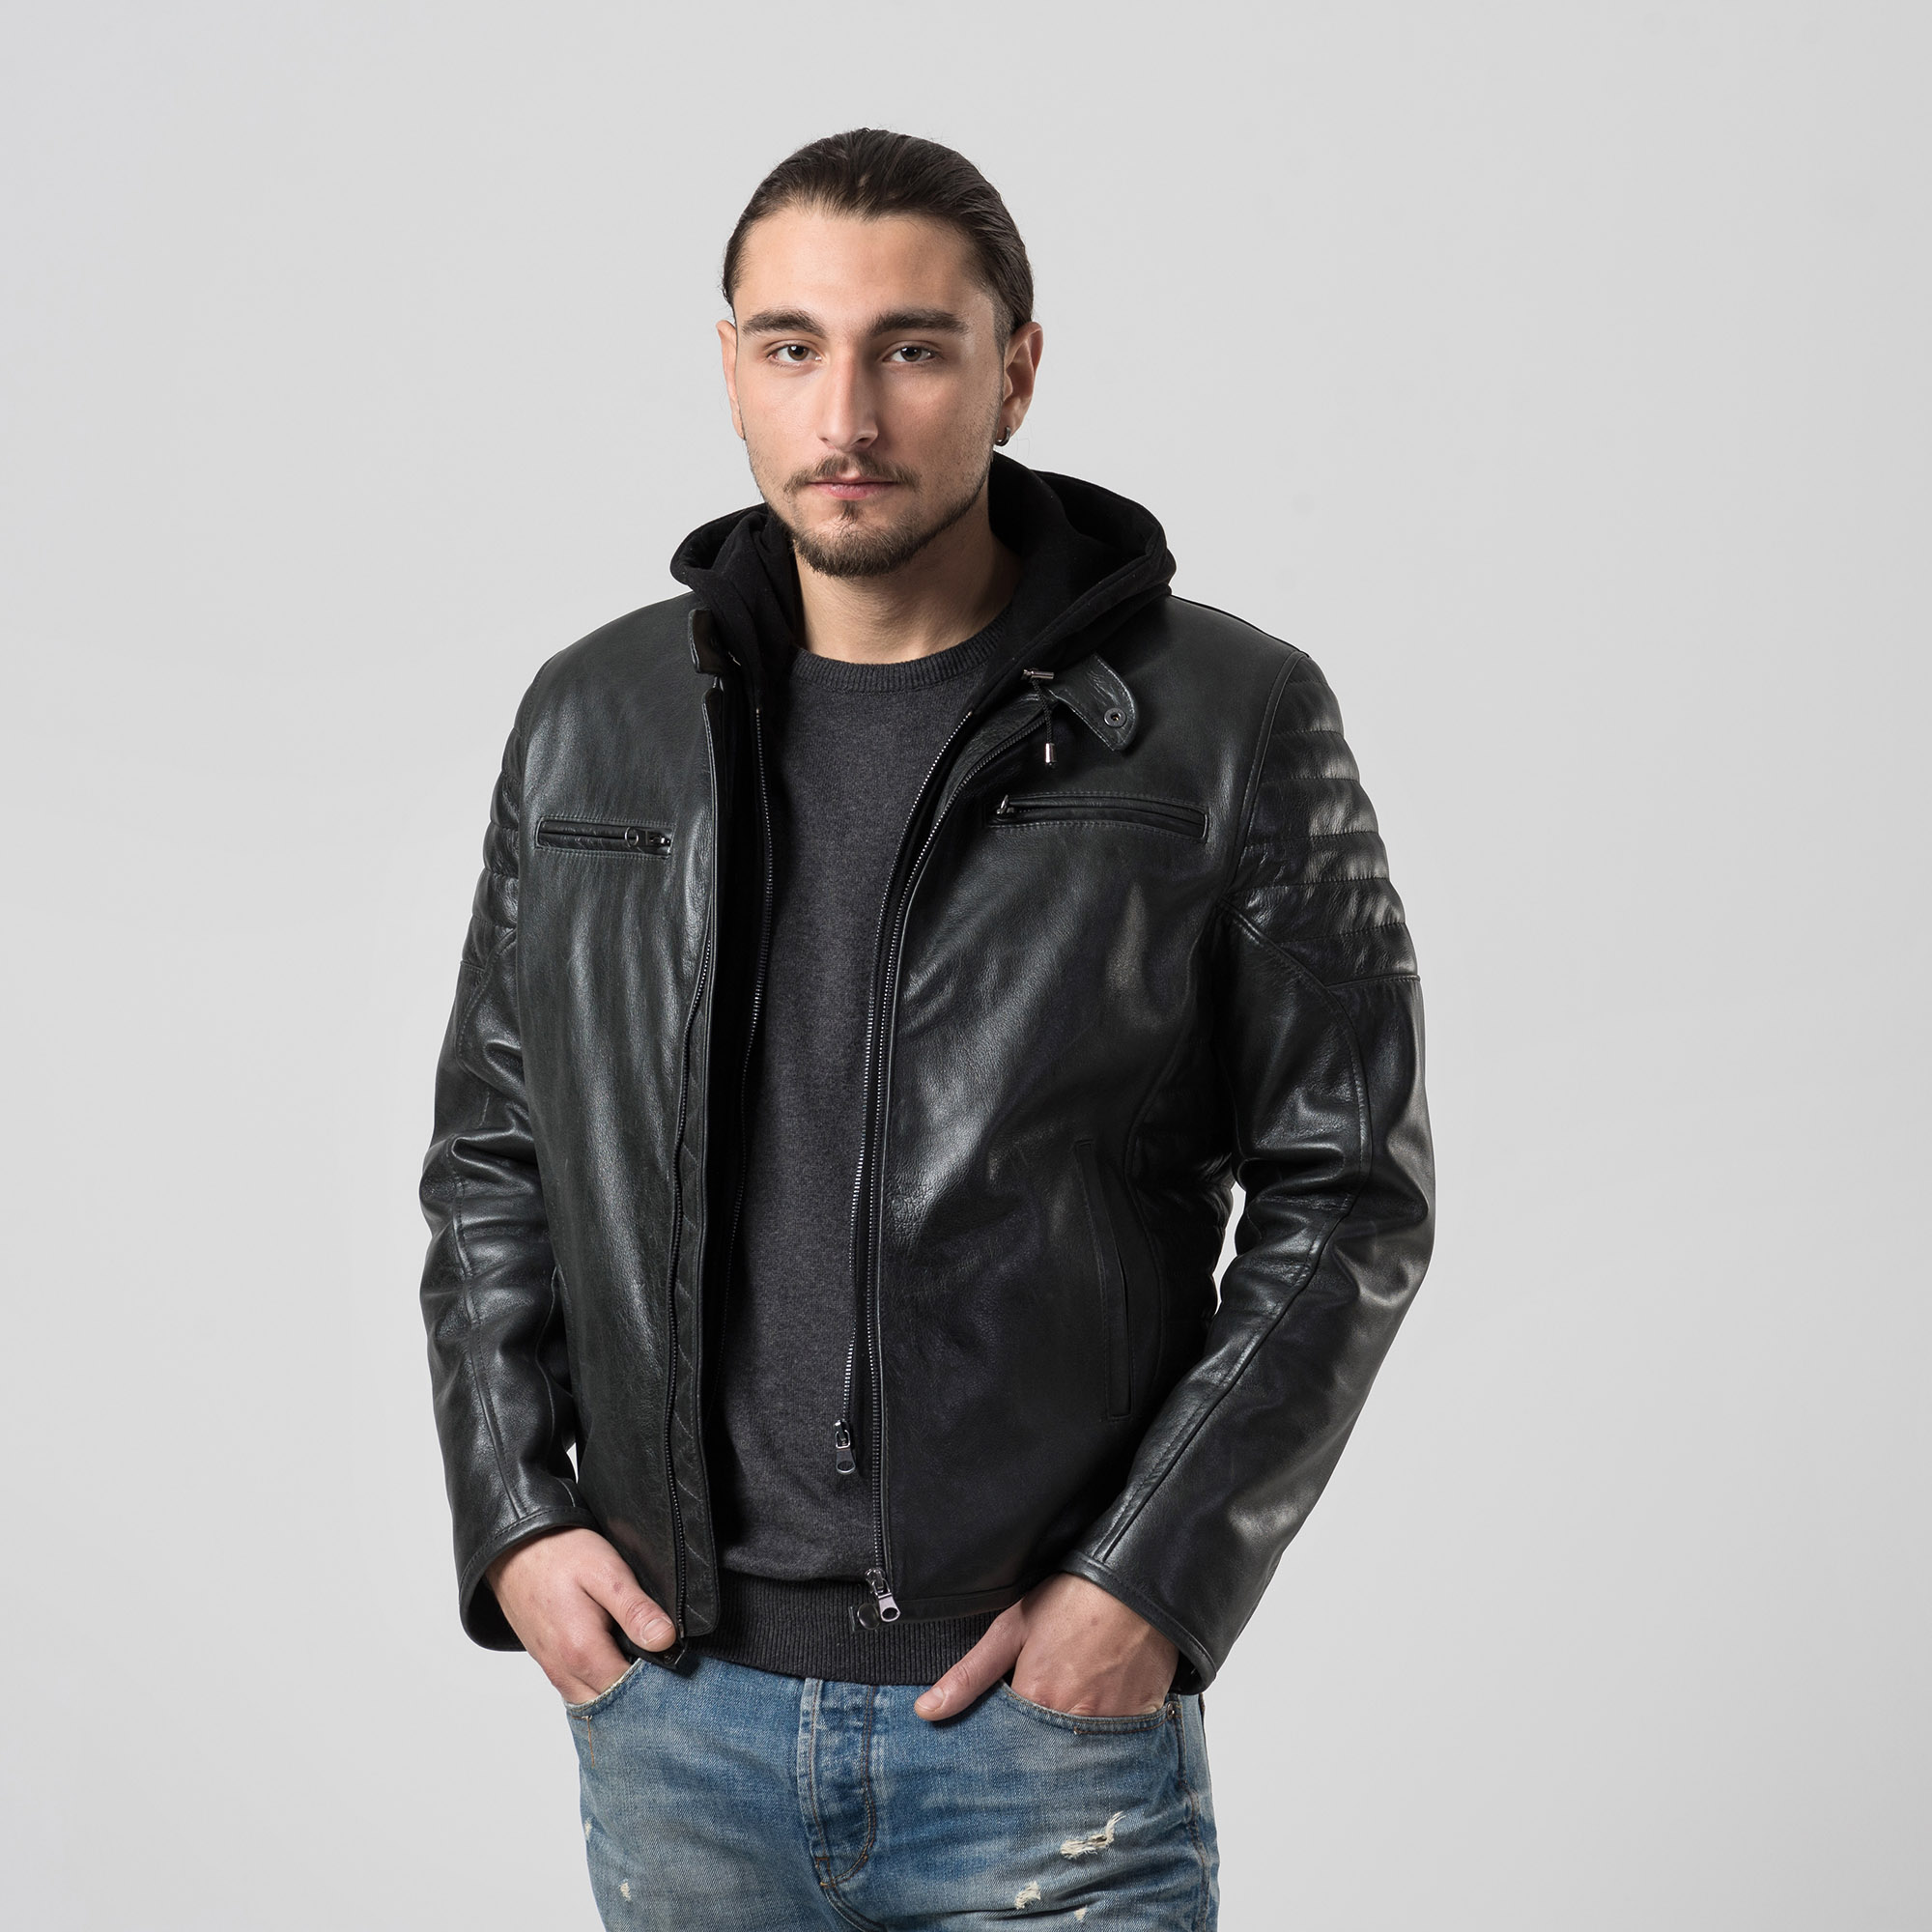 5fbe667120bc Δερμάτινο biker jacket με υφασμάτινη κουκούλα